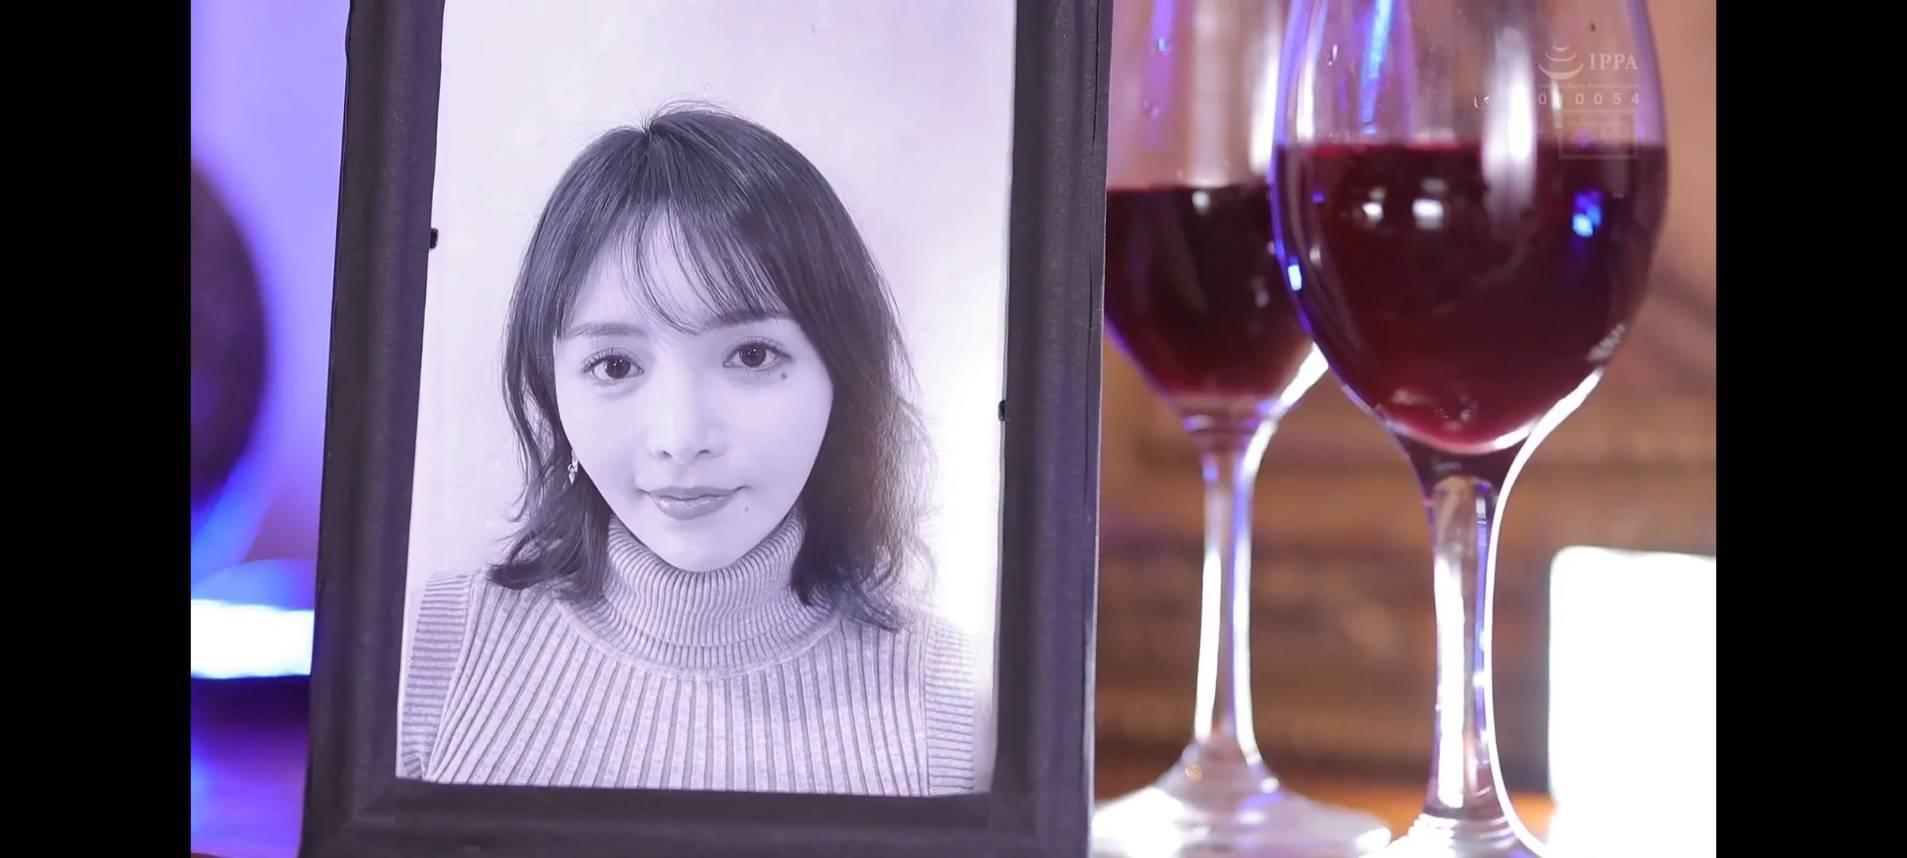 HND-992风格诡异広瀬りおな(广濑里绪菜)表现惊悚 (5)